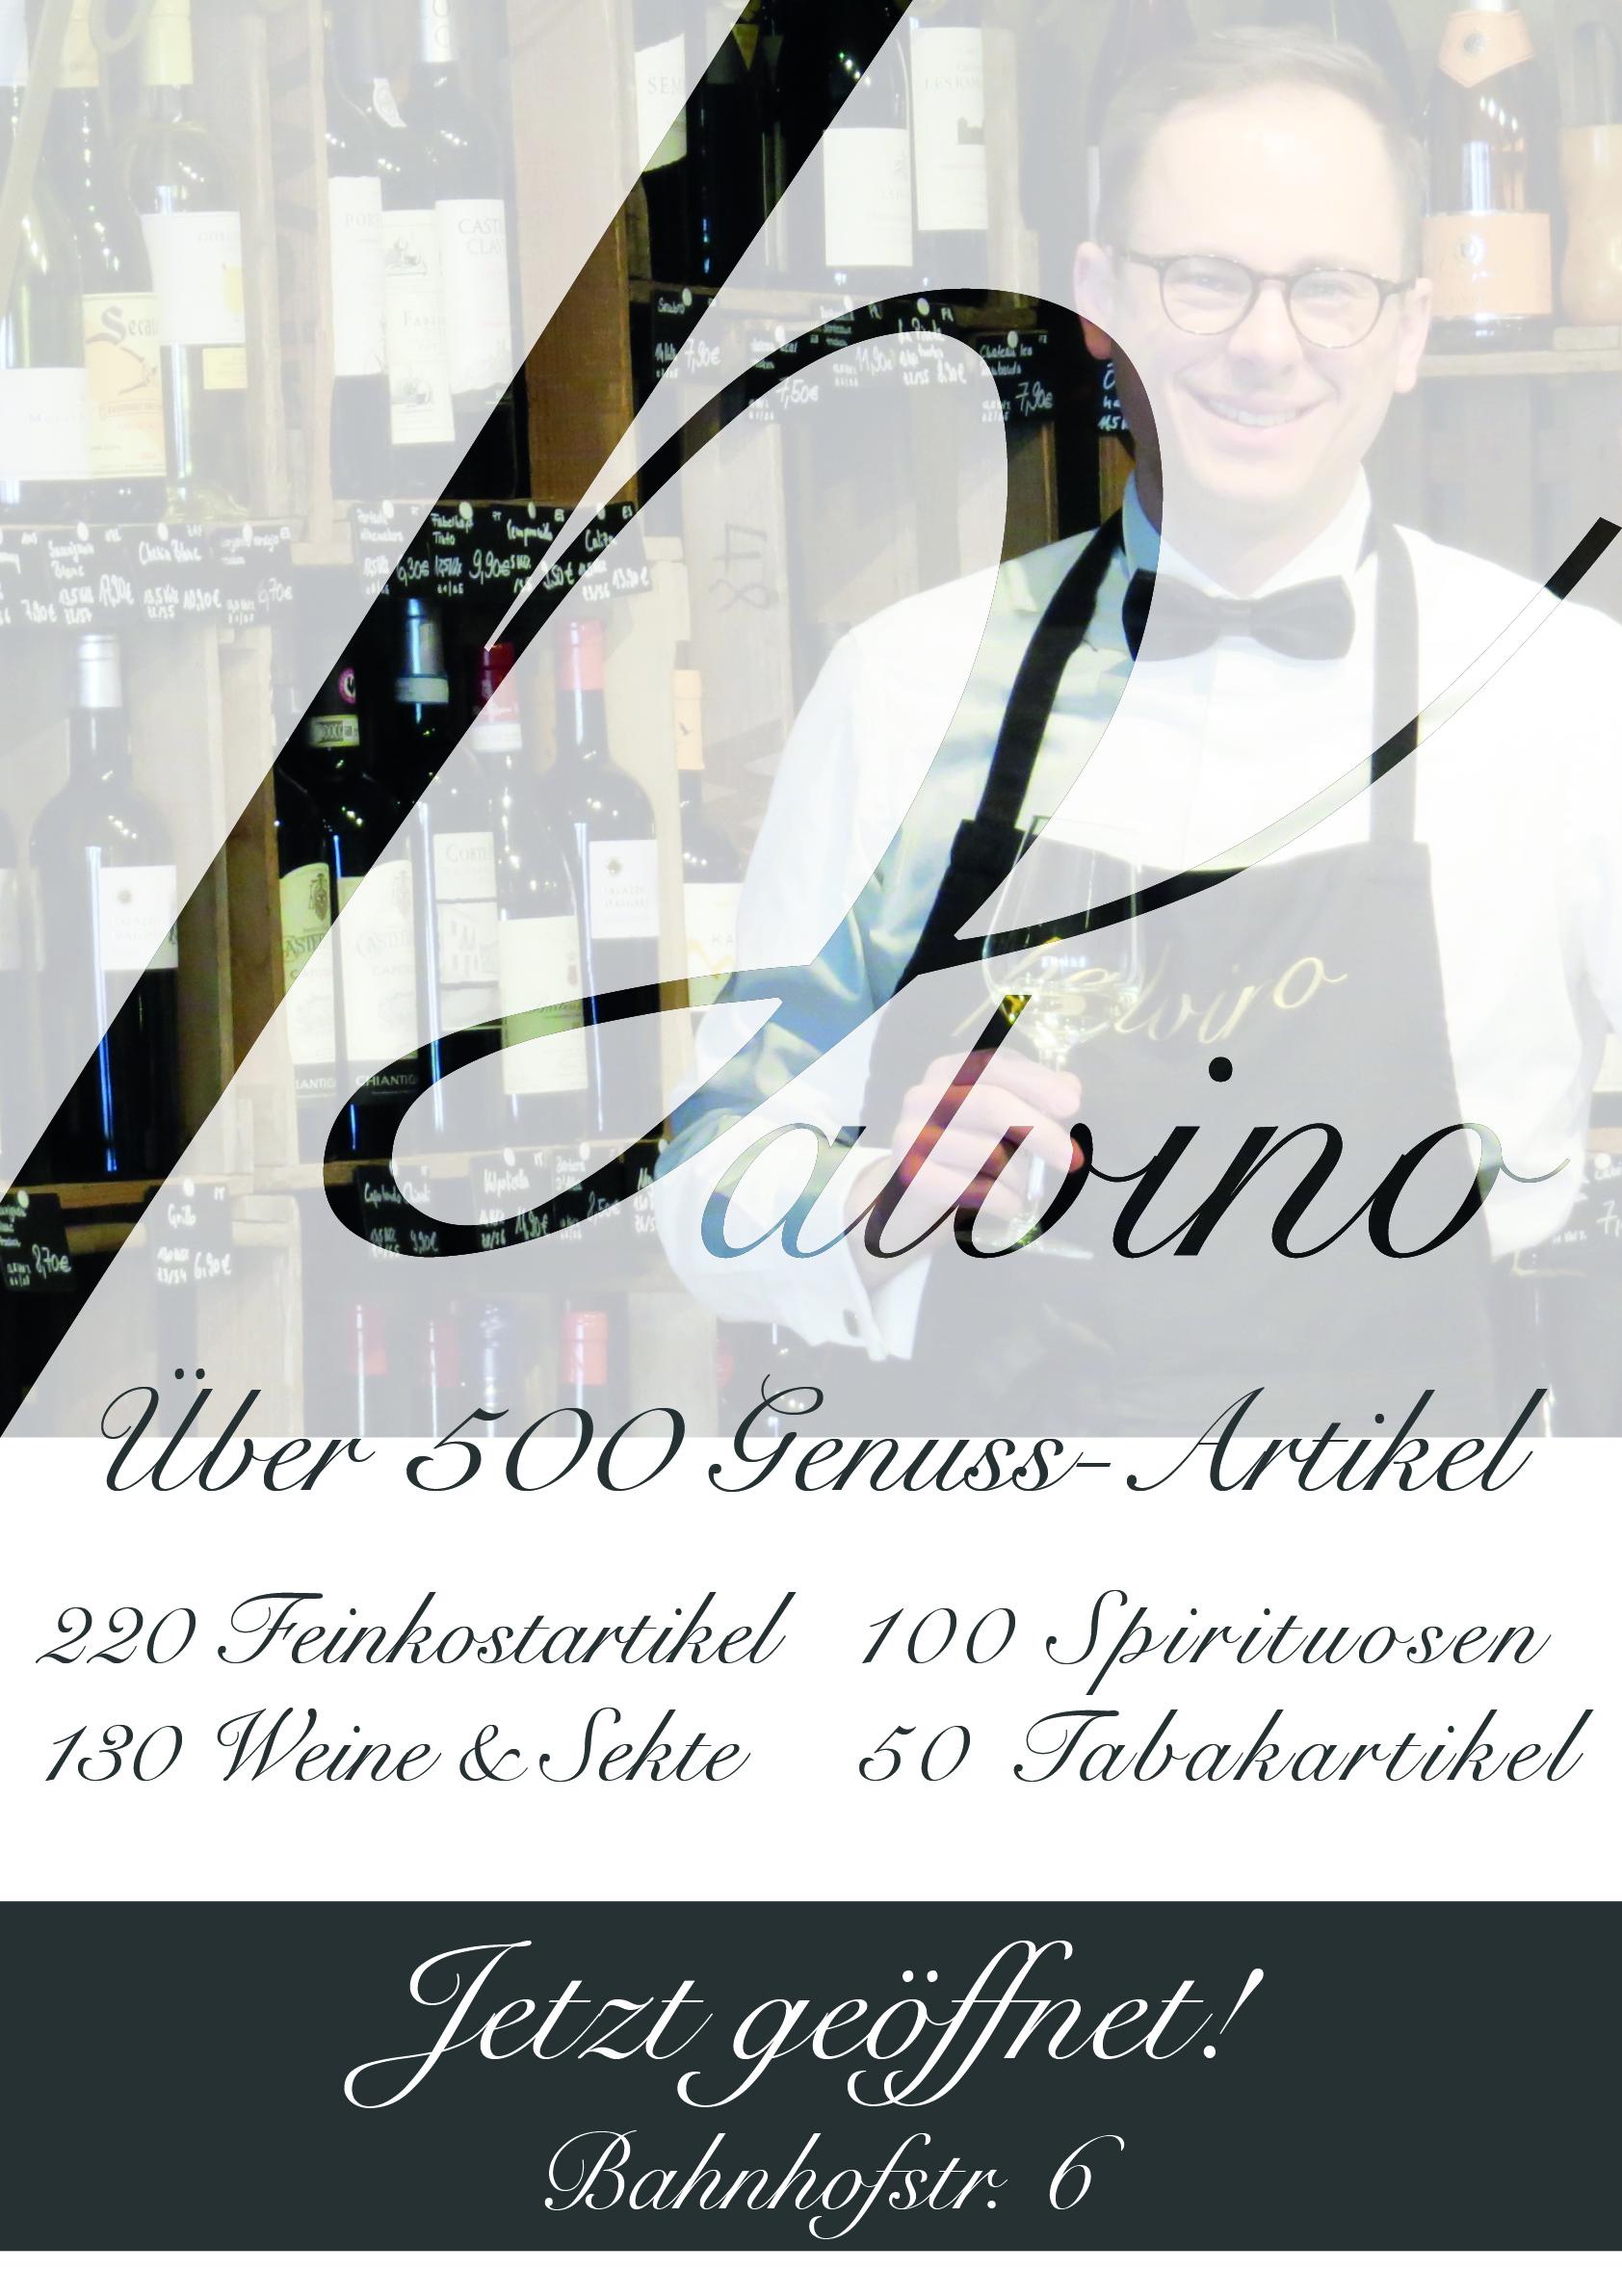 palvino Eppingen Wein Feinkost Spirituosen Tabak